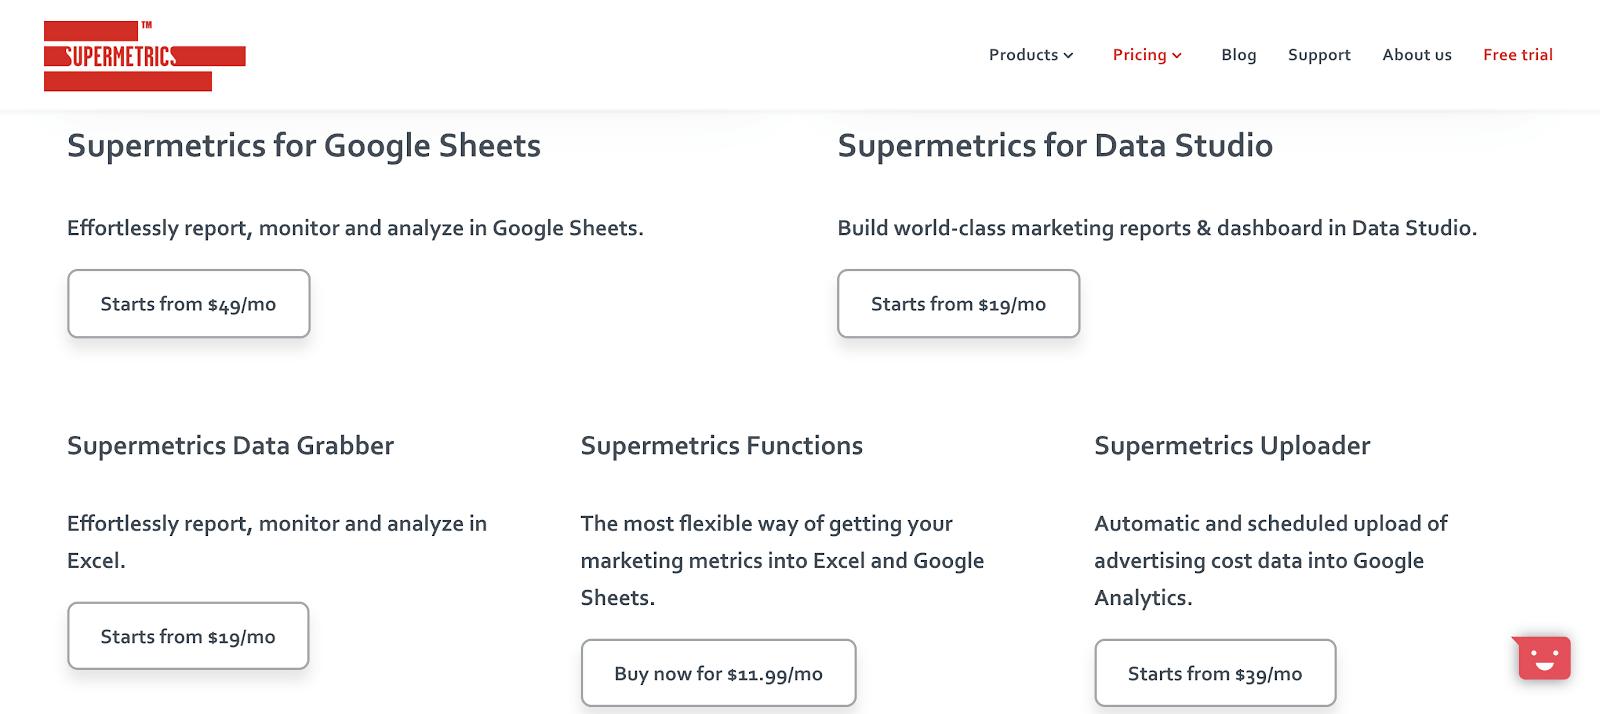 supermetrics pricing